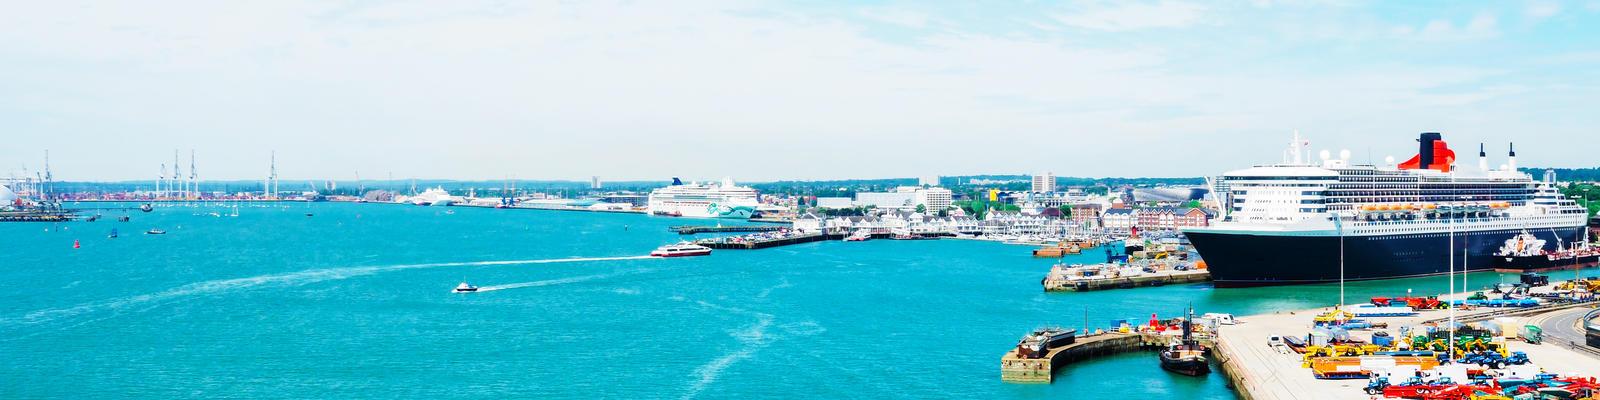 Embarkation in Southampton Cruise Port (Photo: LazarSG/Shutterstock.com)